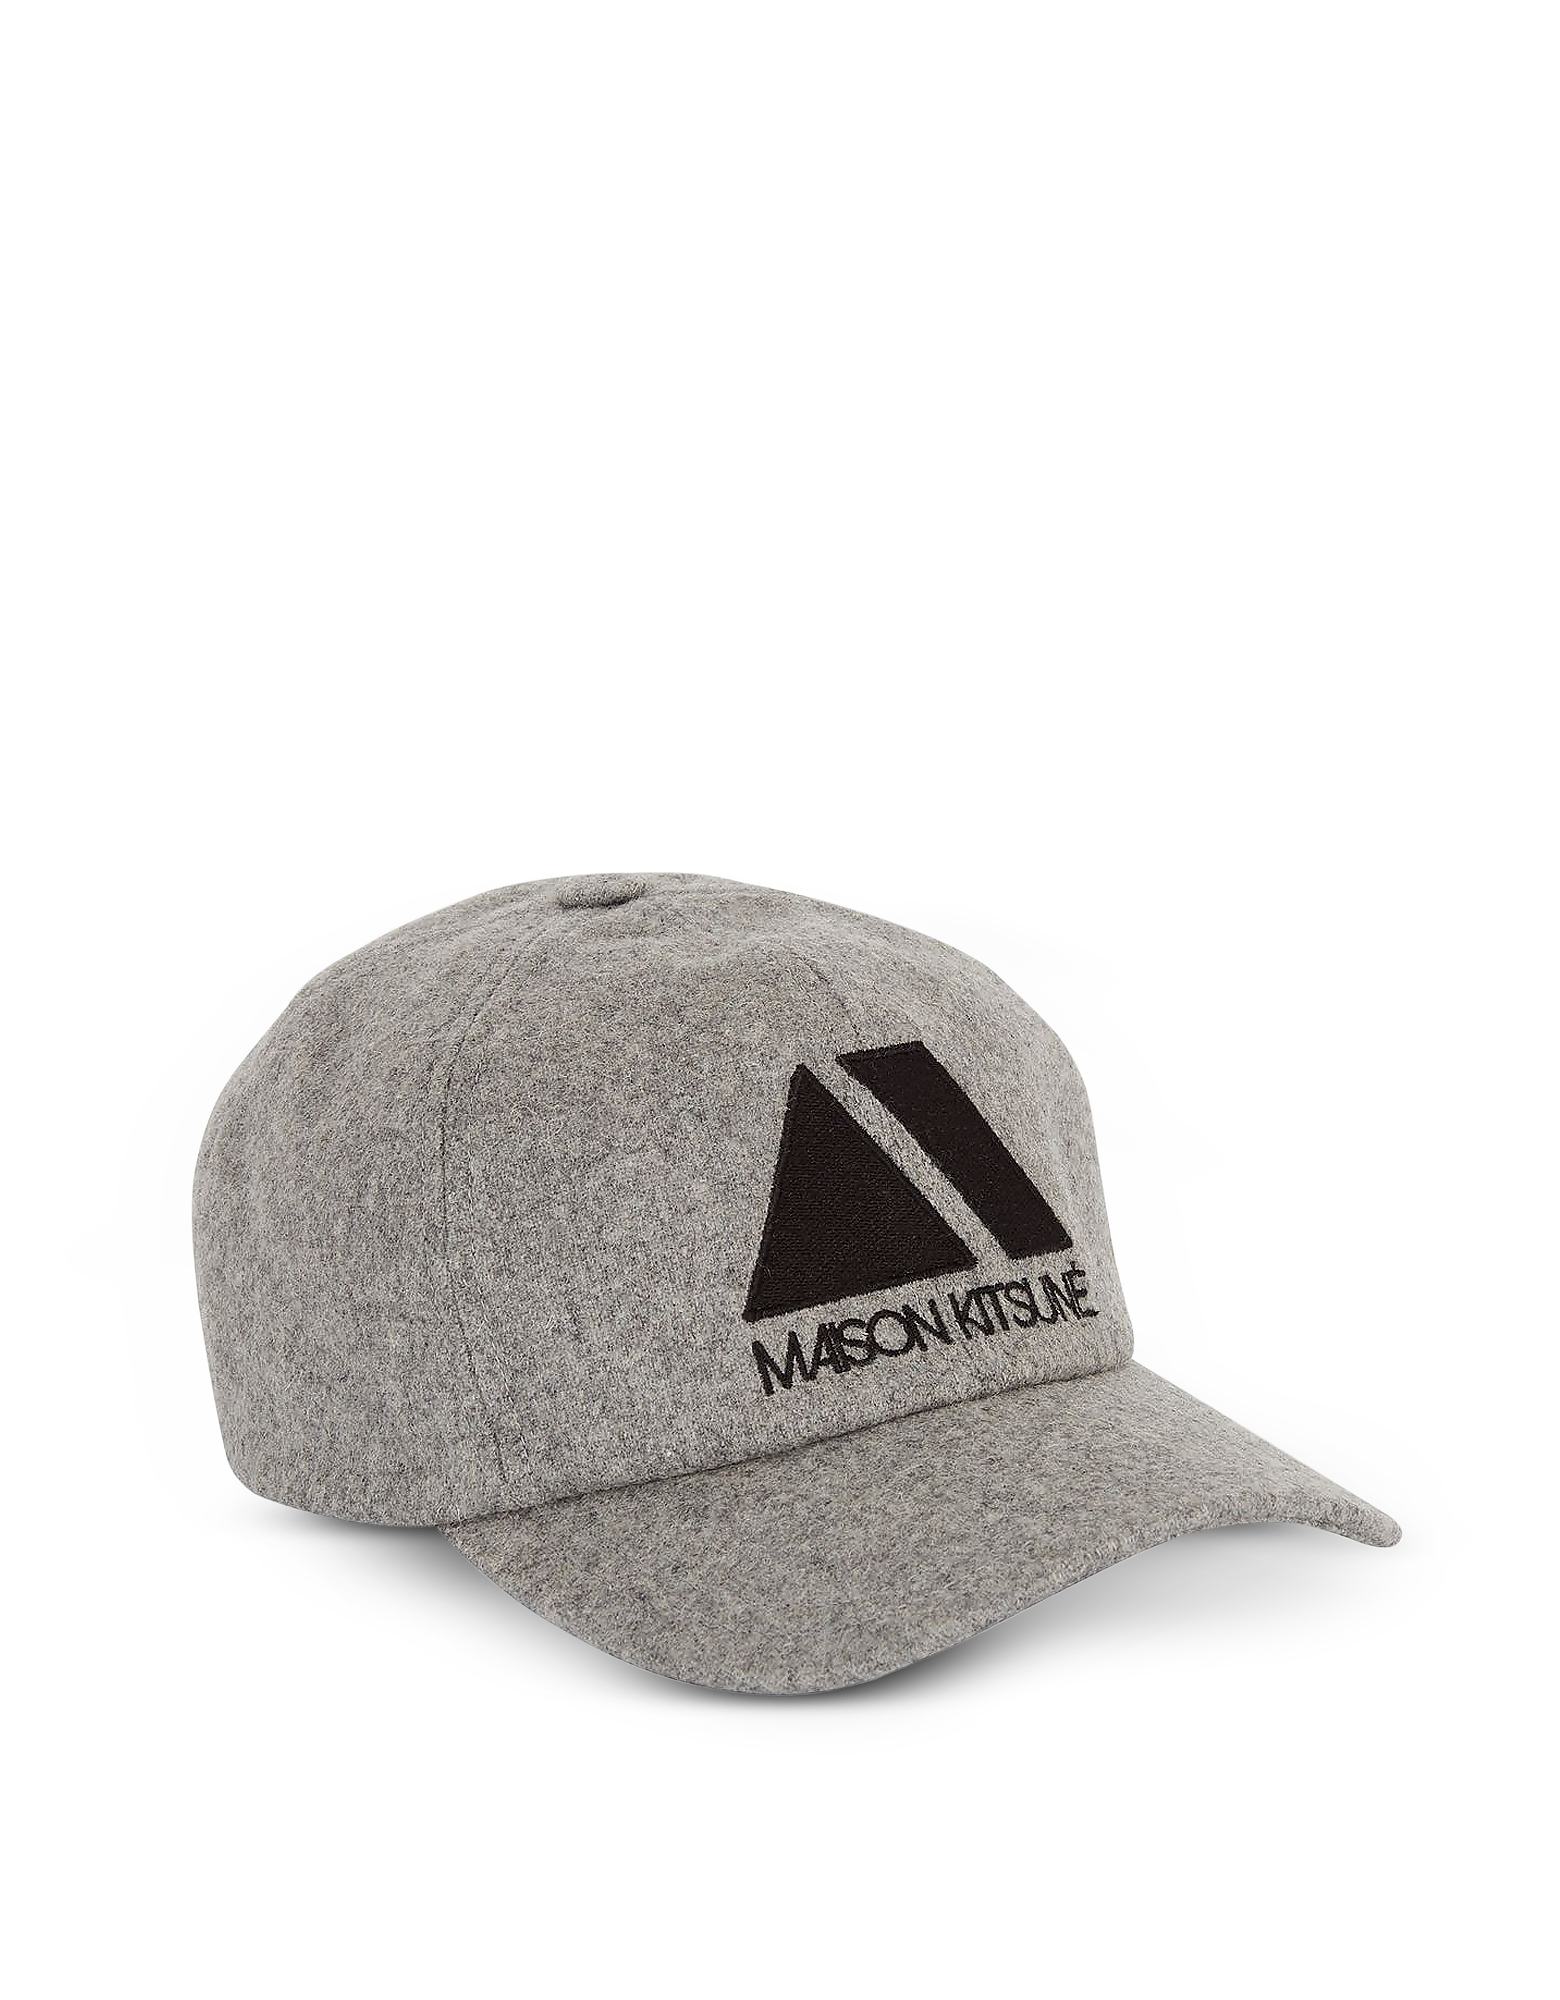 Image of Maison Kitsuné Designer Men's Hats, Light Grey Wool Blend 6P Triangle Baseball Cap